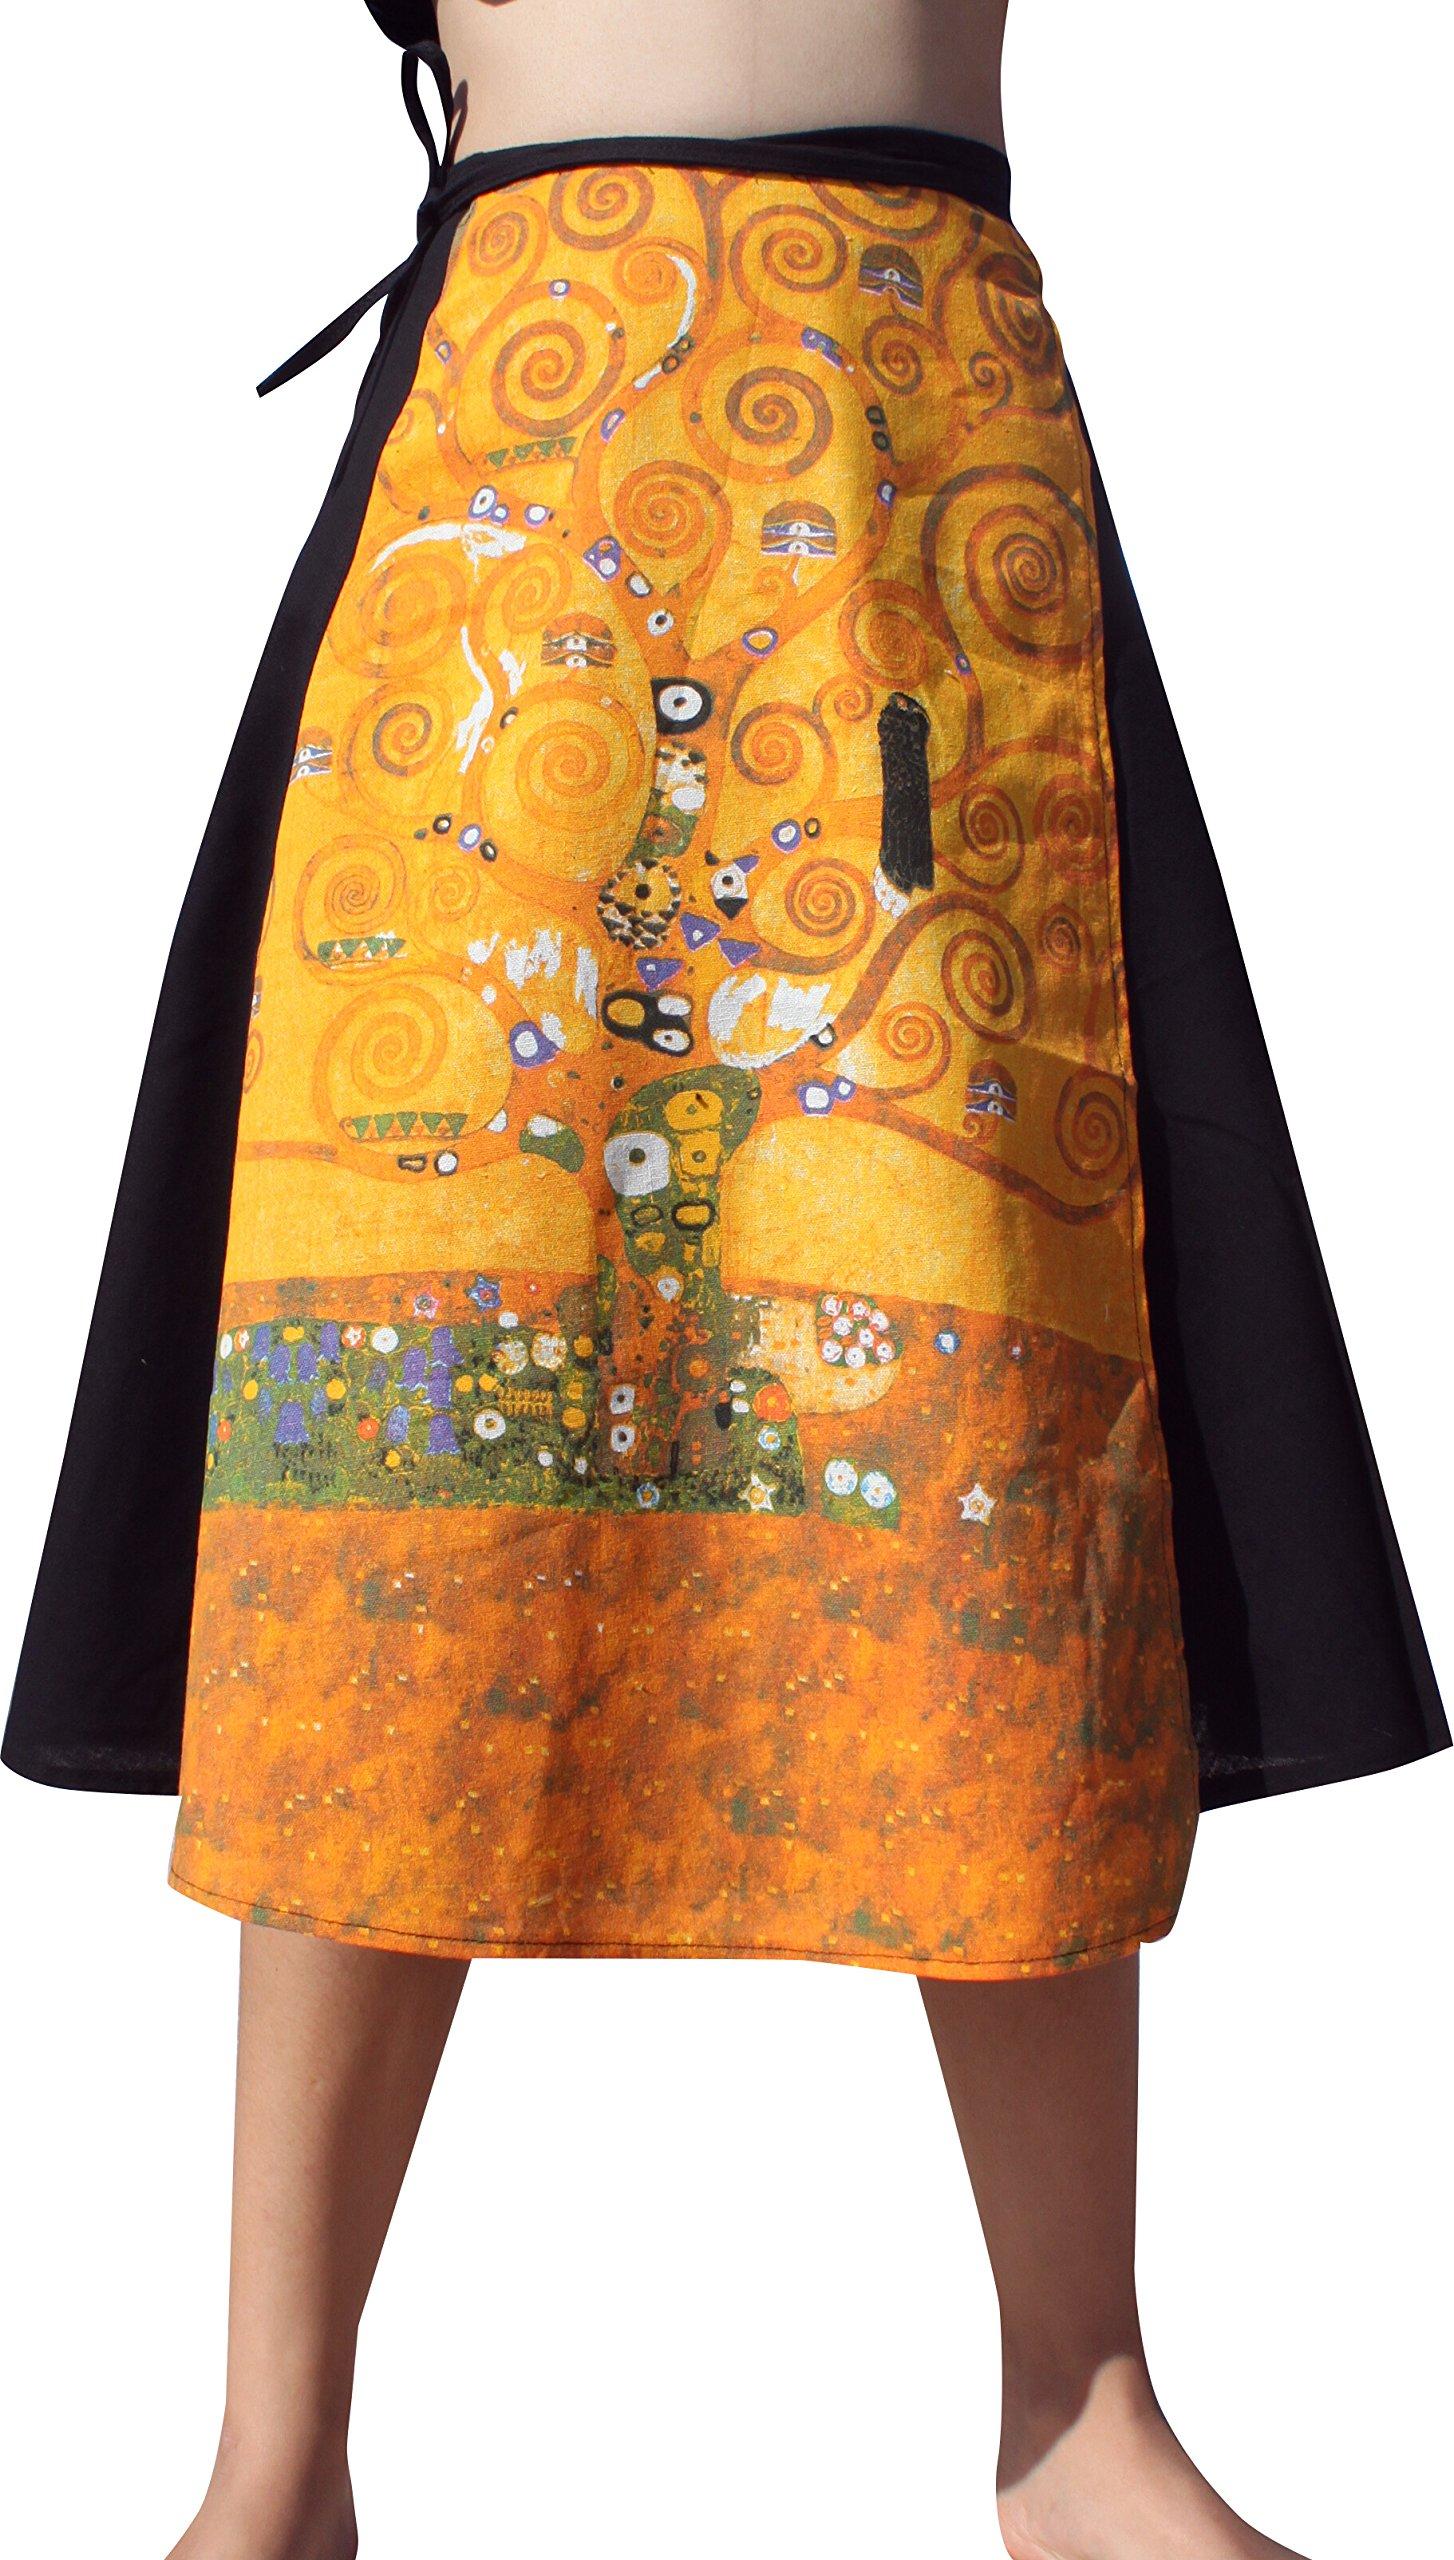 Raan Pah Muang RaanPahMuang Gustav Klimt The Tree Of Life 3/4 Length Wrap Skirt by Raan Pah Muang